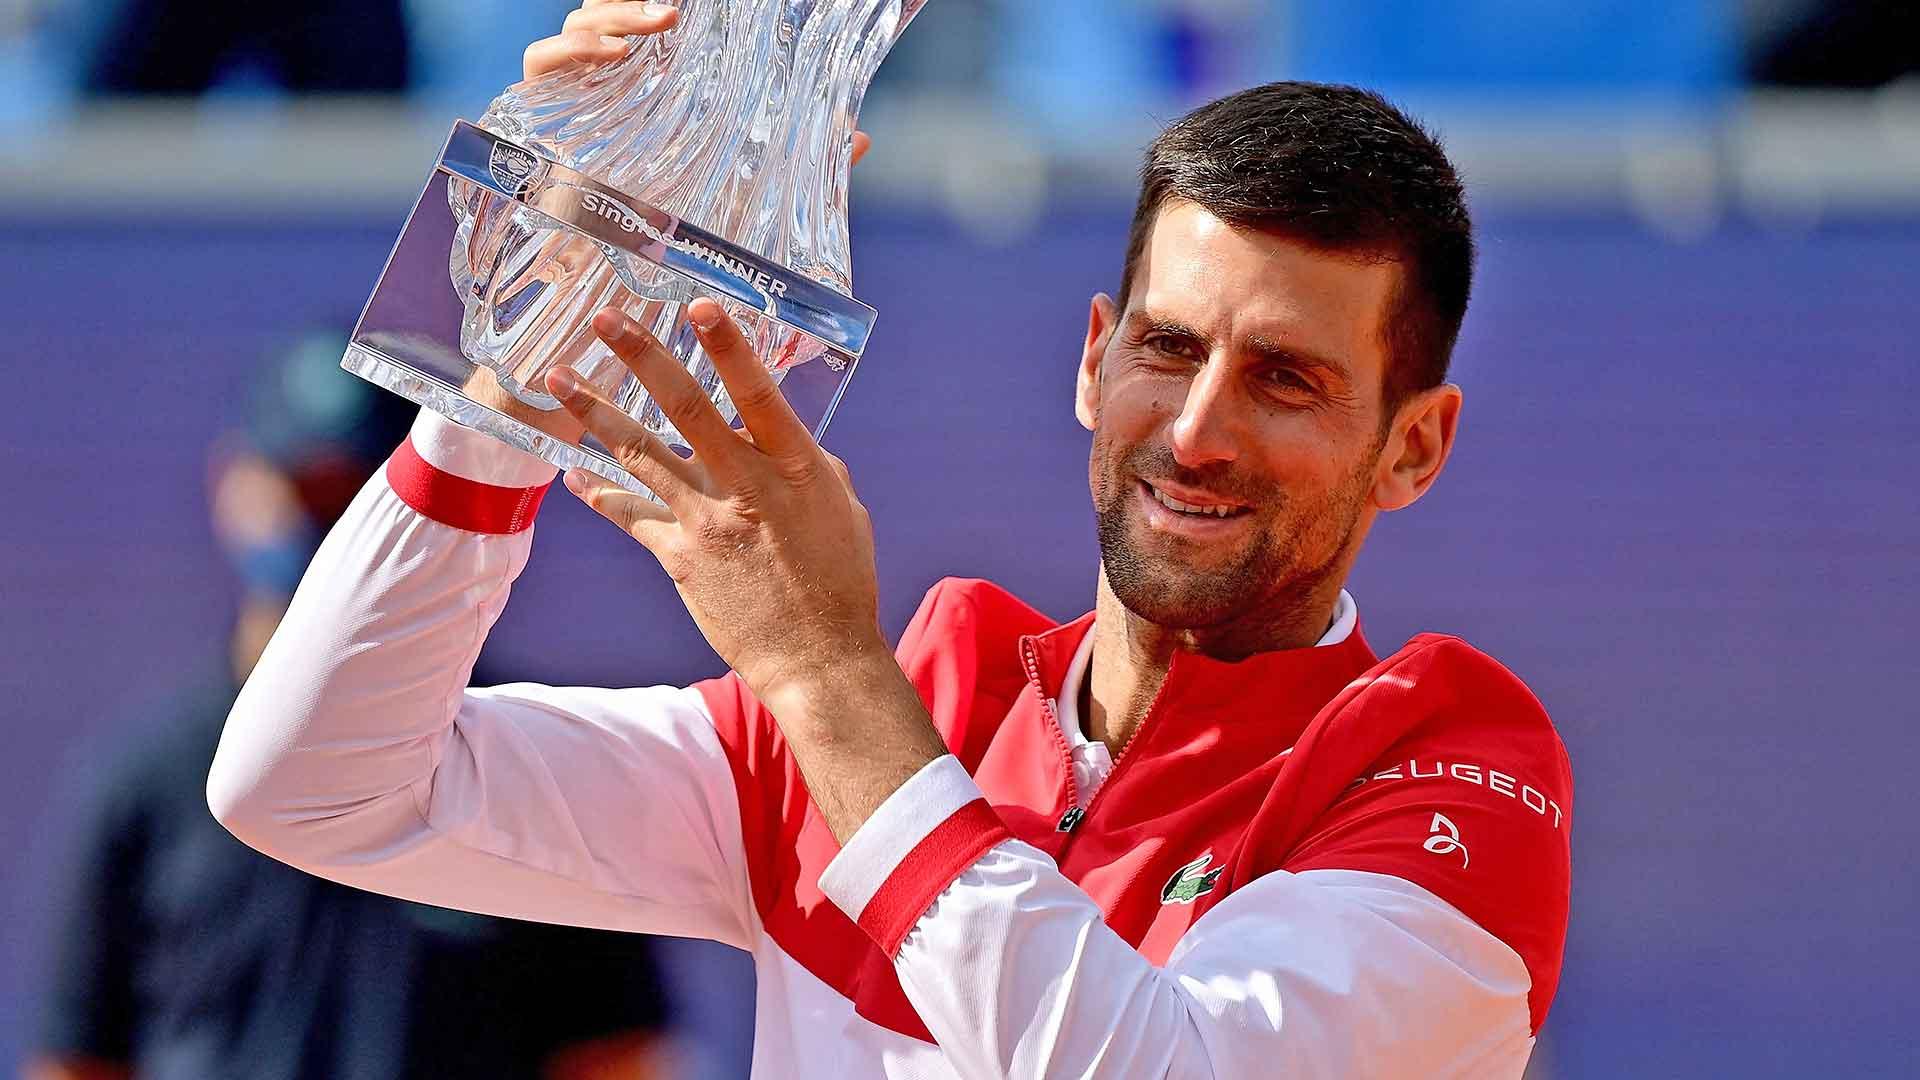 Djokovic Wins 83rd Career Title In Belgrade open   பெல்கிரேடில் ஜோகோவிச் 83 வது பட்டத்தை வென்றார்  _40.1